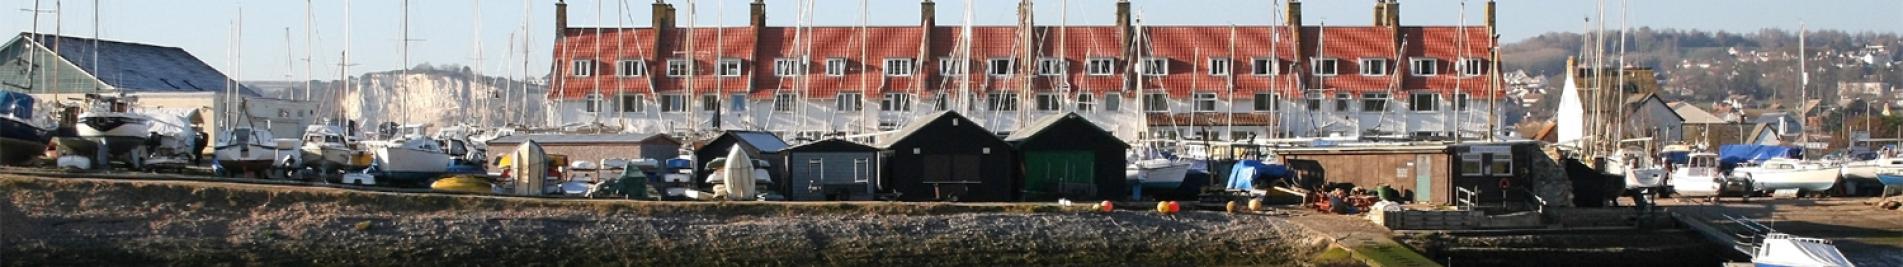 267-dorset-seafront